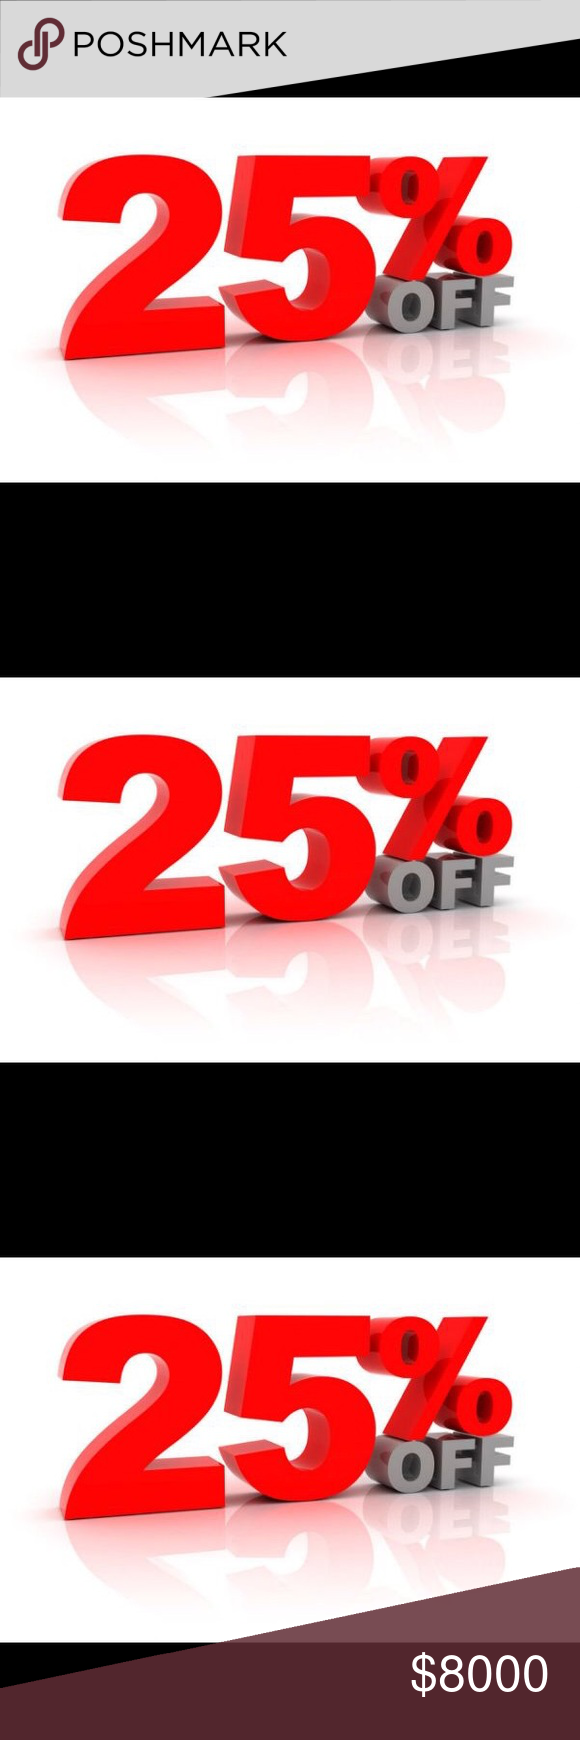 Single Item 25 Percent Off 25 Percent Off Single Item Discount Please Tag Me So I Can Take It Off Access Clothes Design Fashion Design Accessories